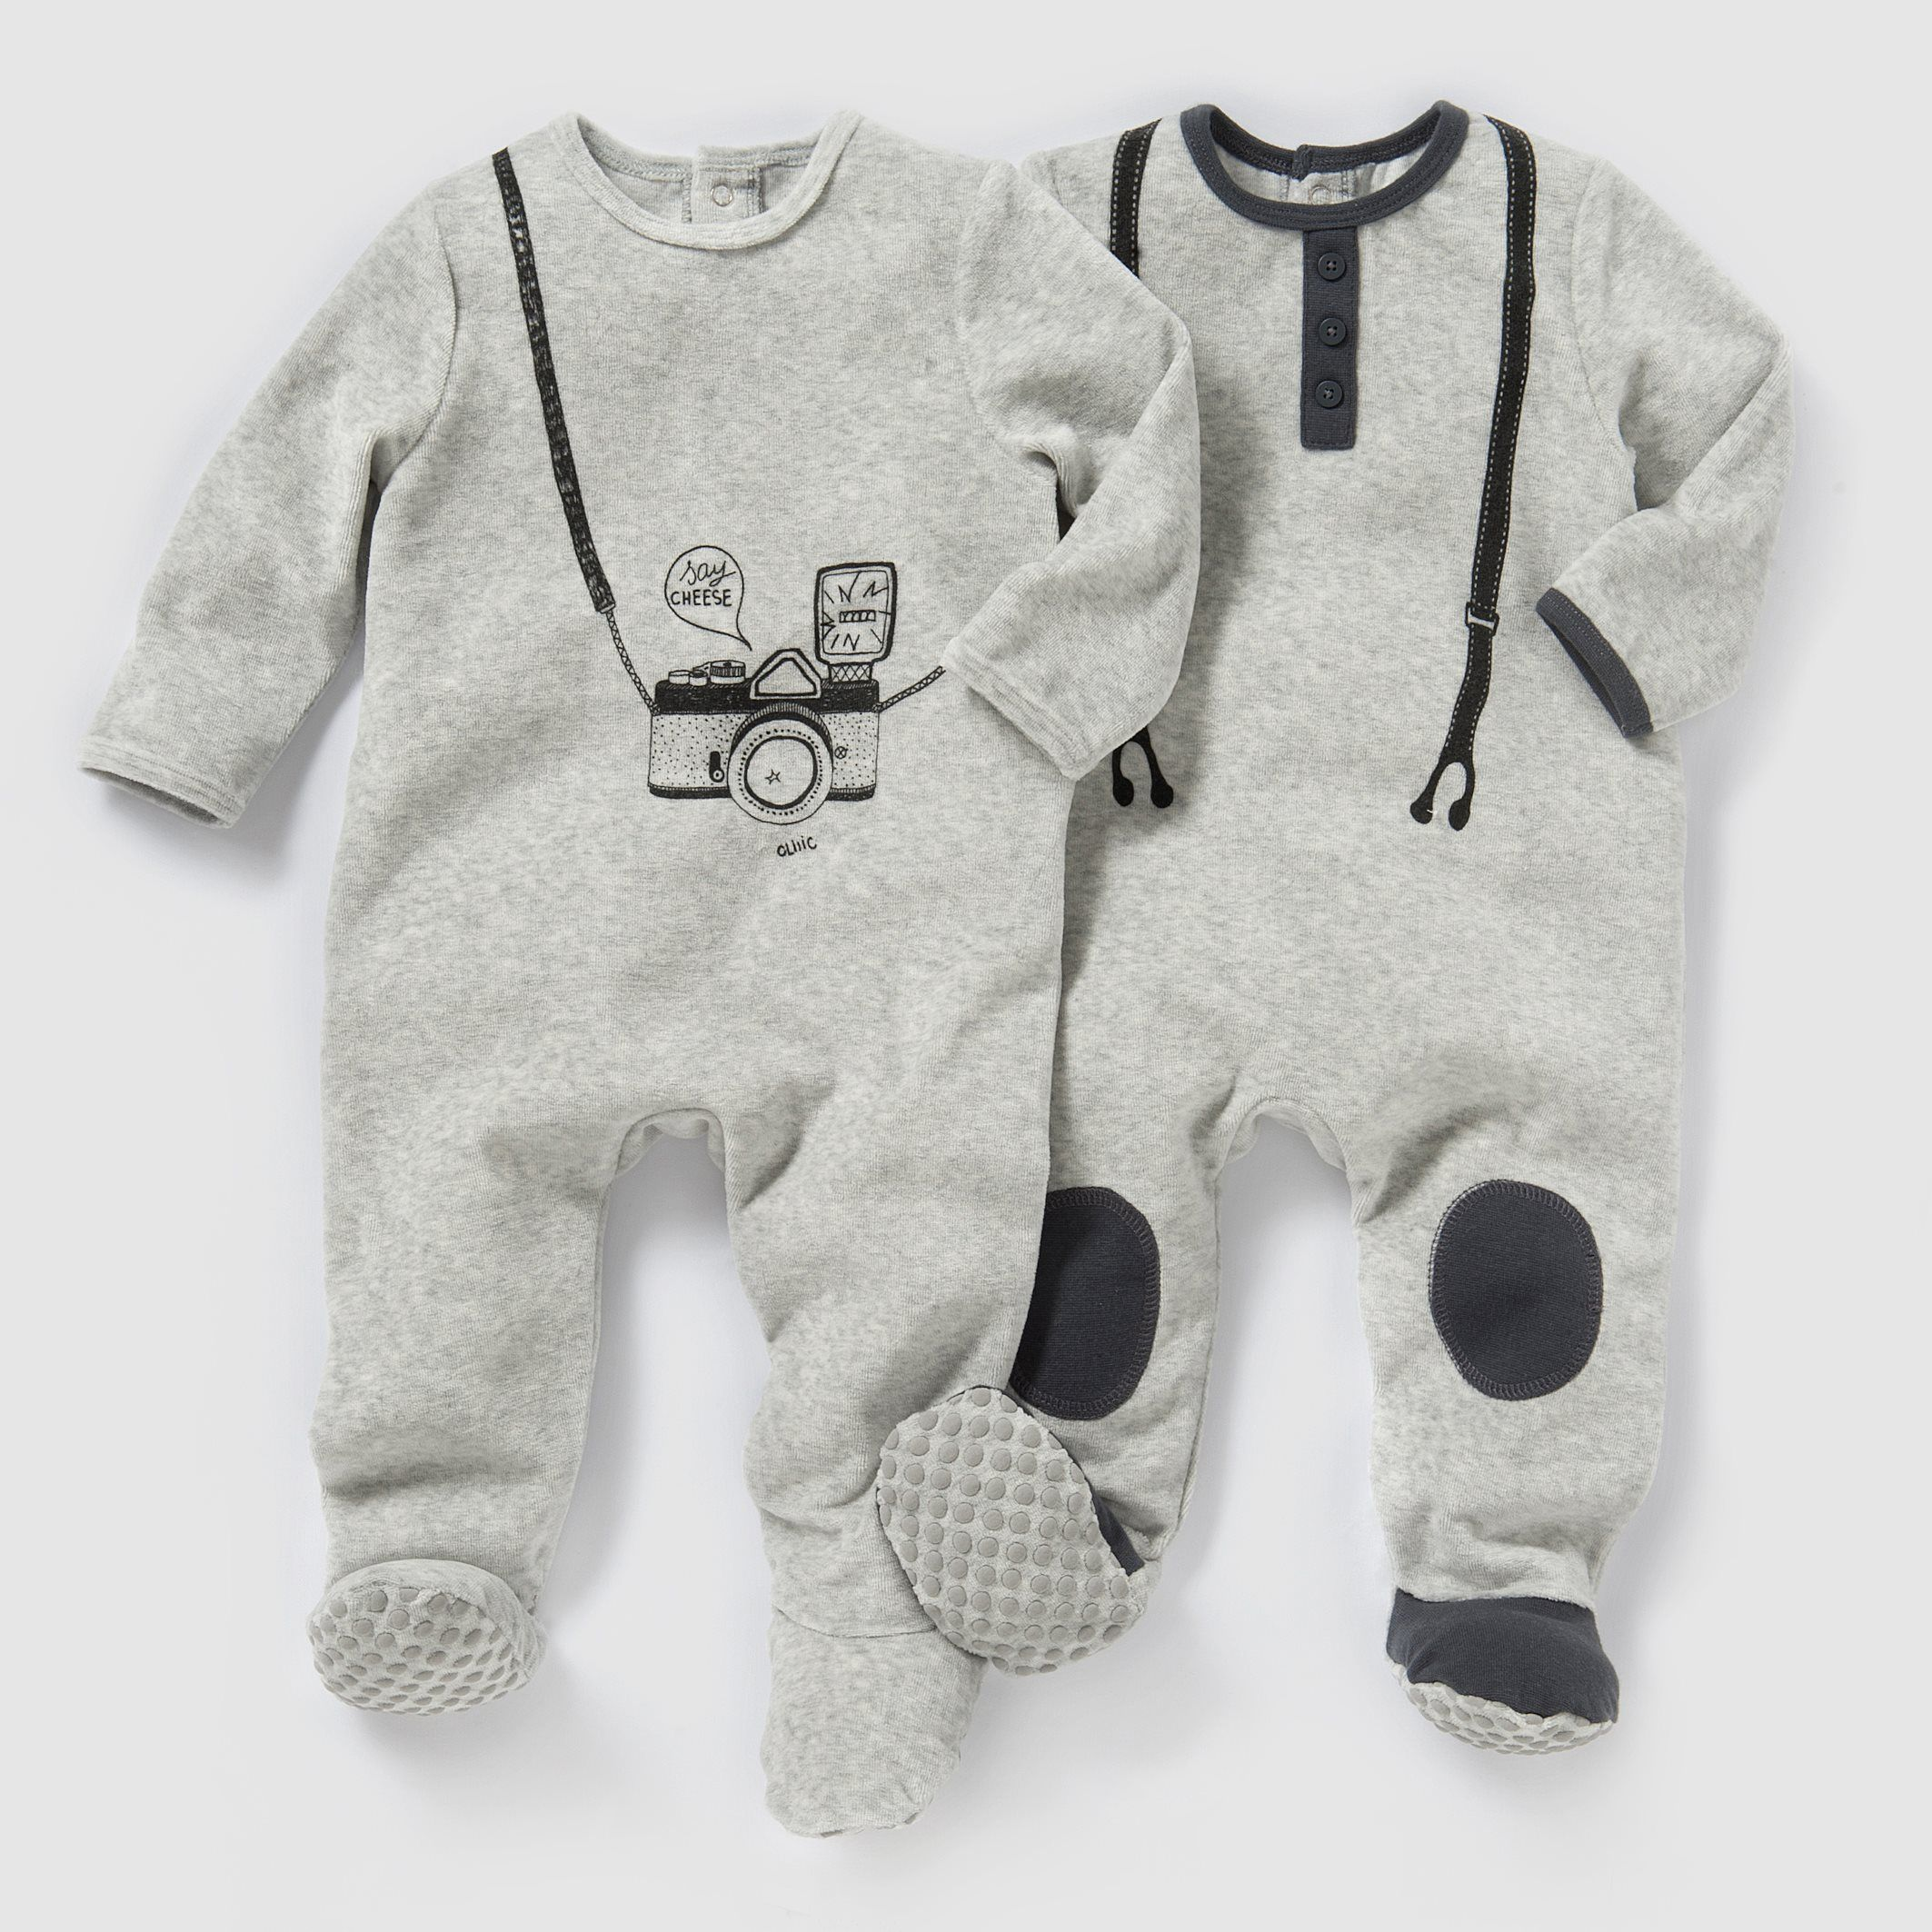 7bed262b8aab6 Pyjama velours (lot de 2) 0 mois-3 ans R Mini